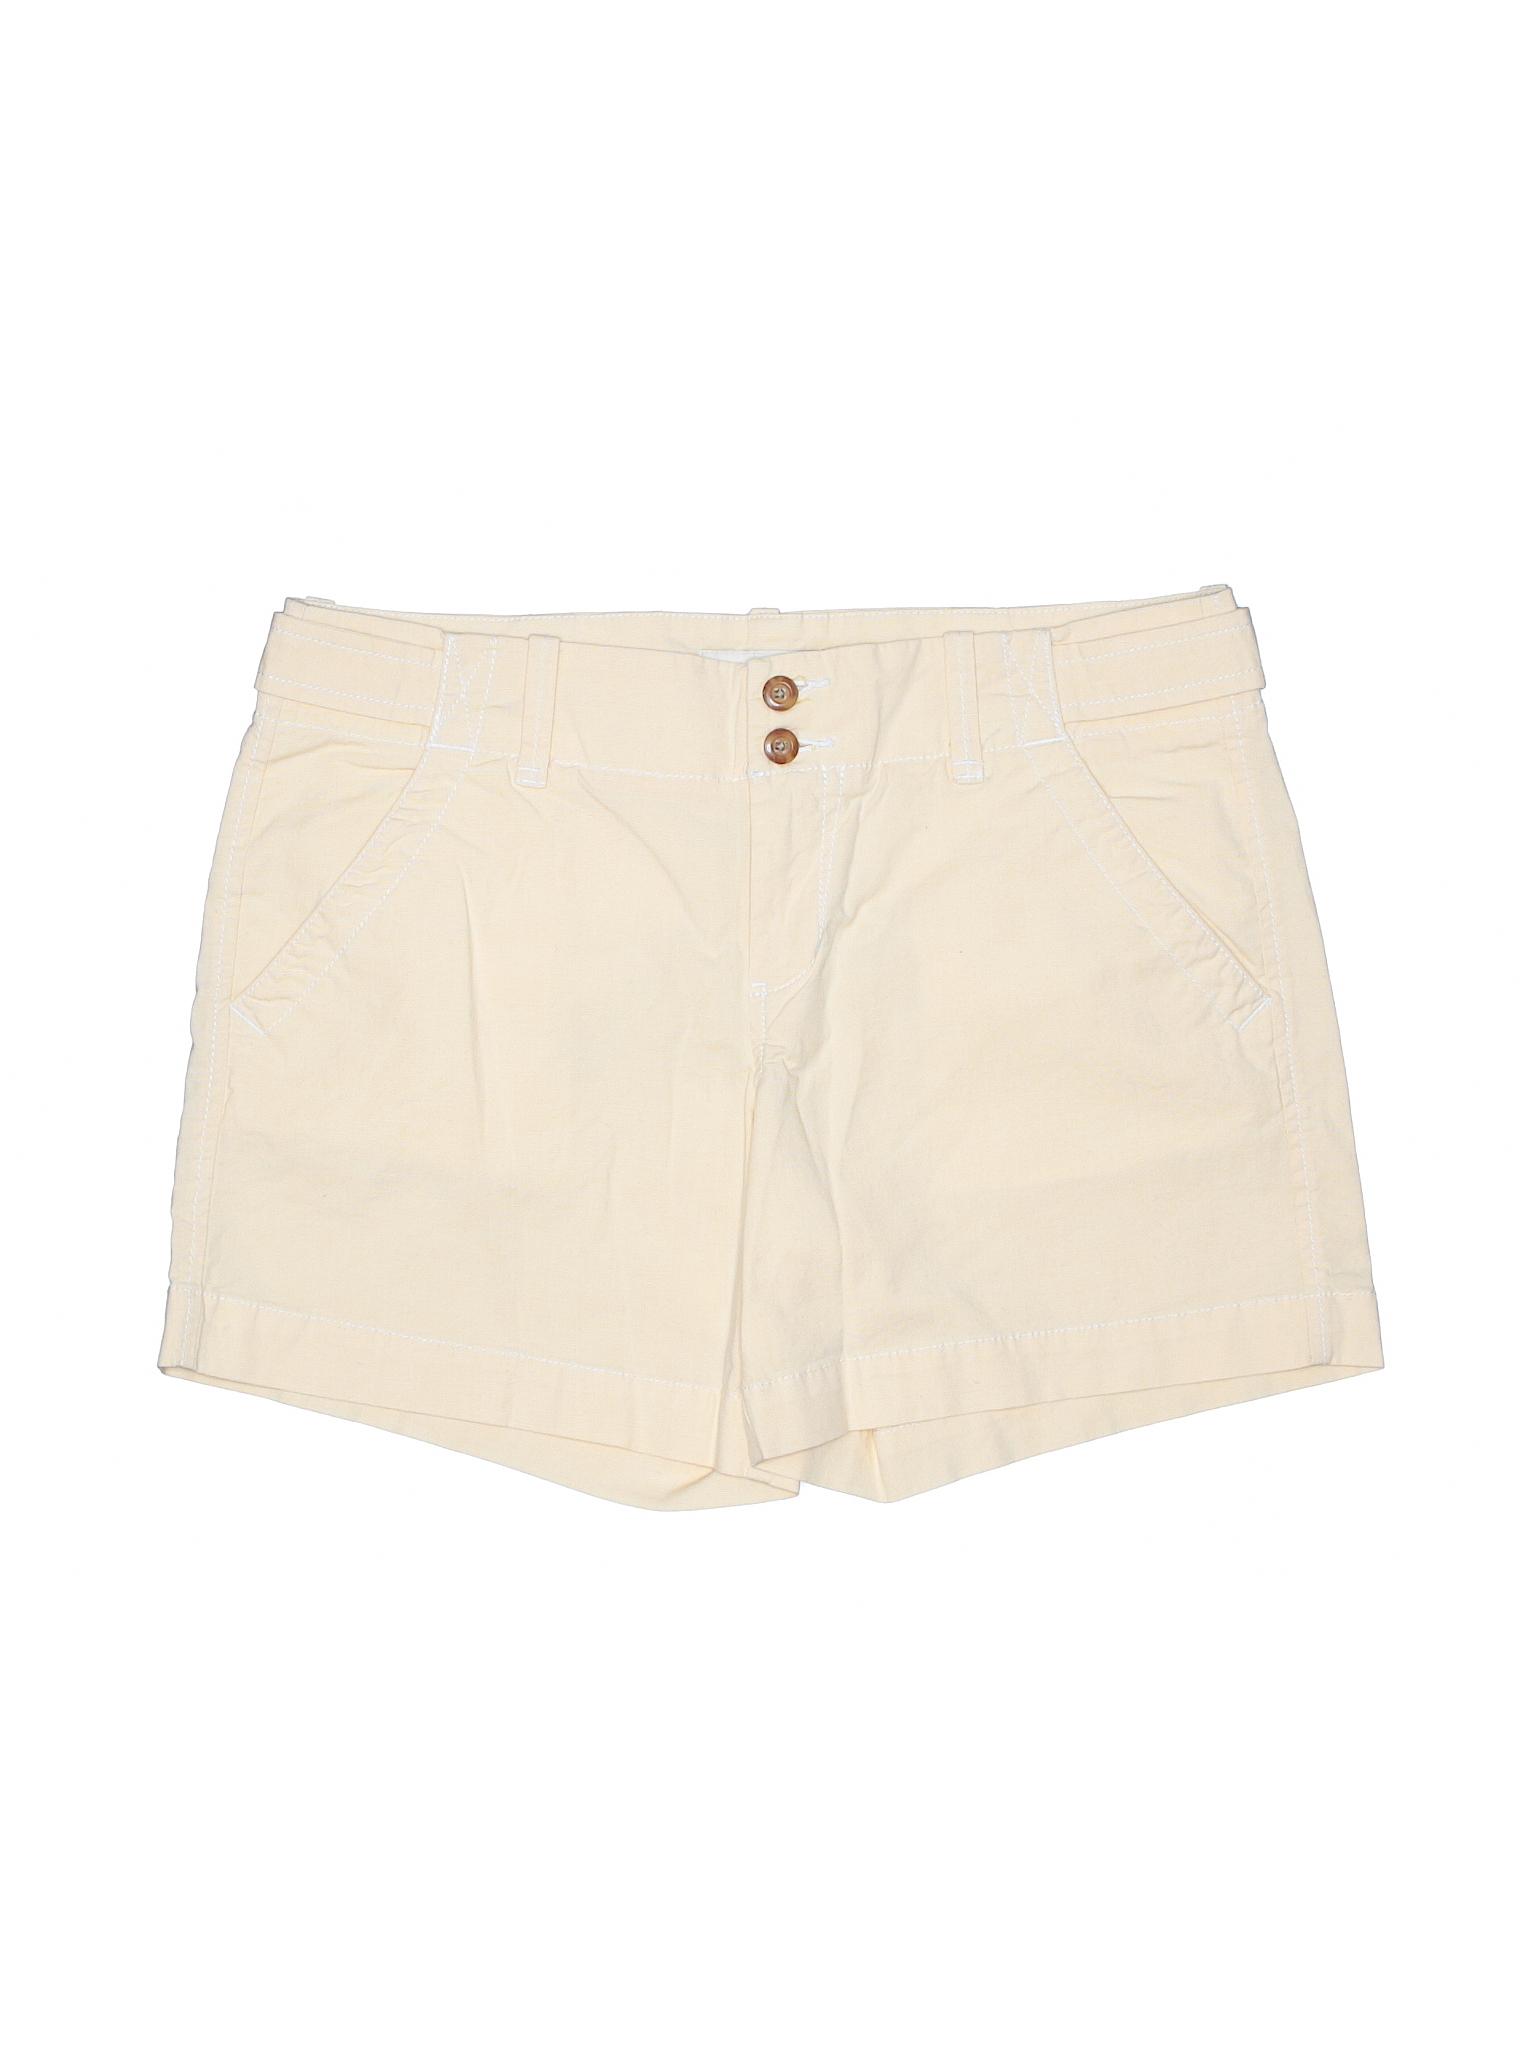 winter Old Shorts Khaki Boutique Navy 0qBq1